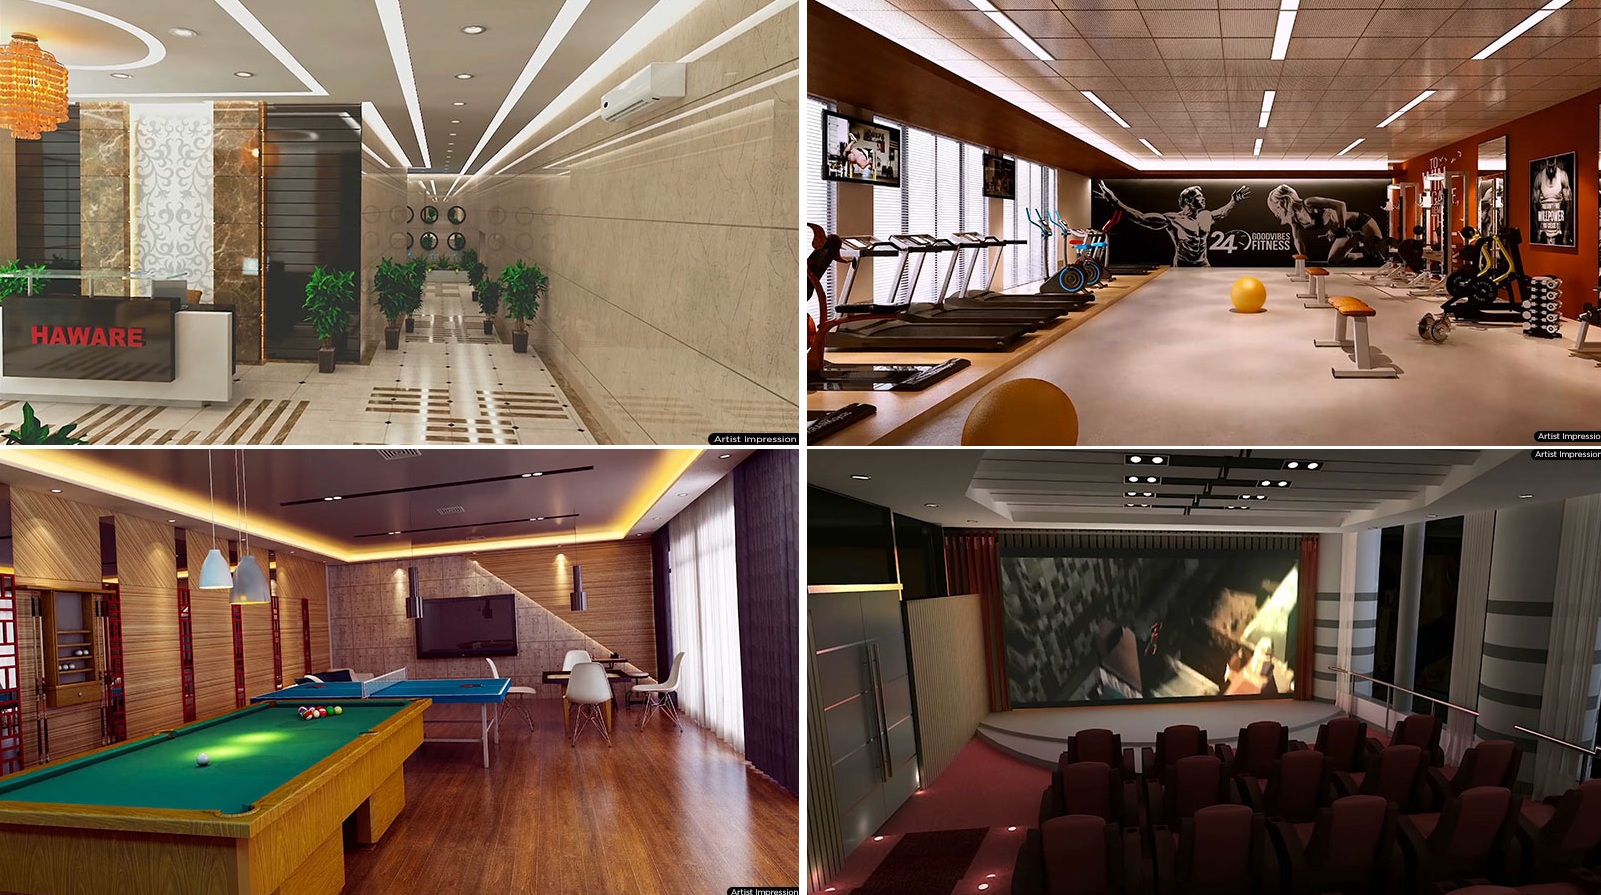 haware intelligentia spectrum project amenities features2